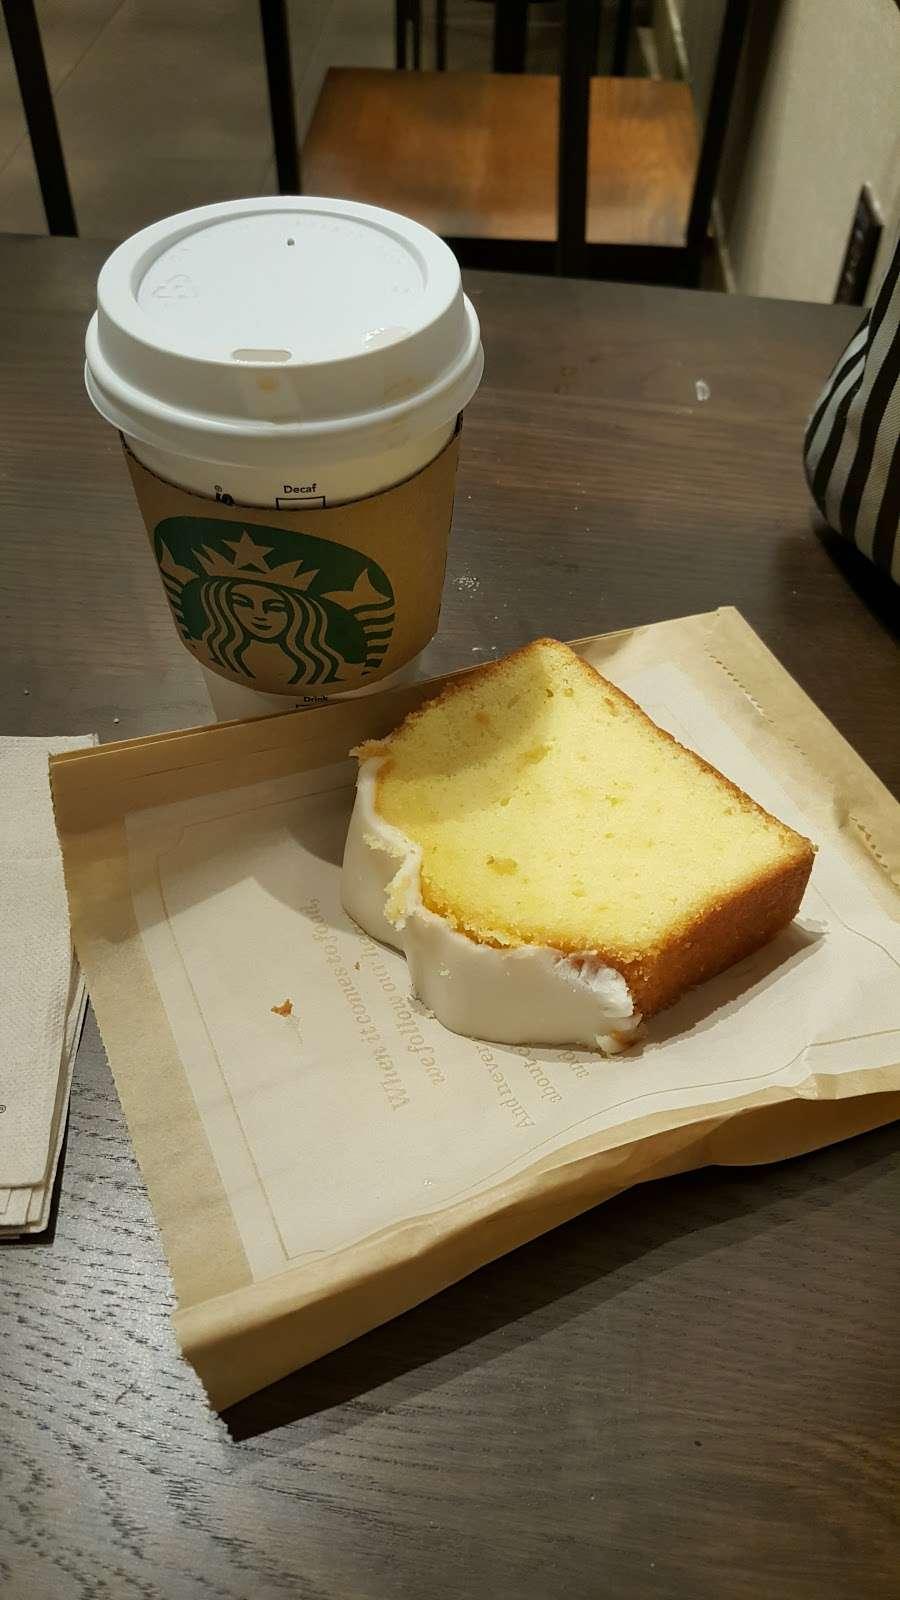 Starbucks - cafe    Photo 8 of 10   Address: 5757 Wilshire Blvd #106, Los Angeles, CA 90036, USA   Phone: (323) 931-1013